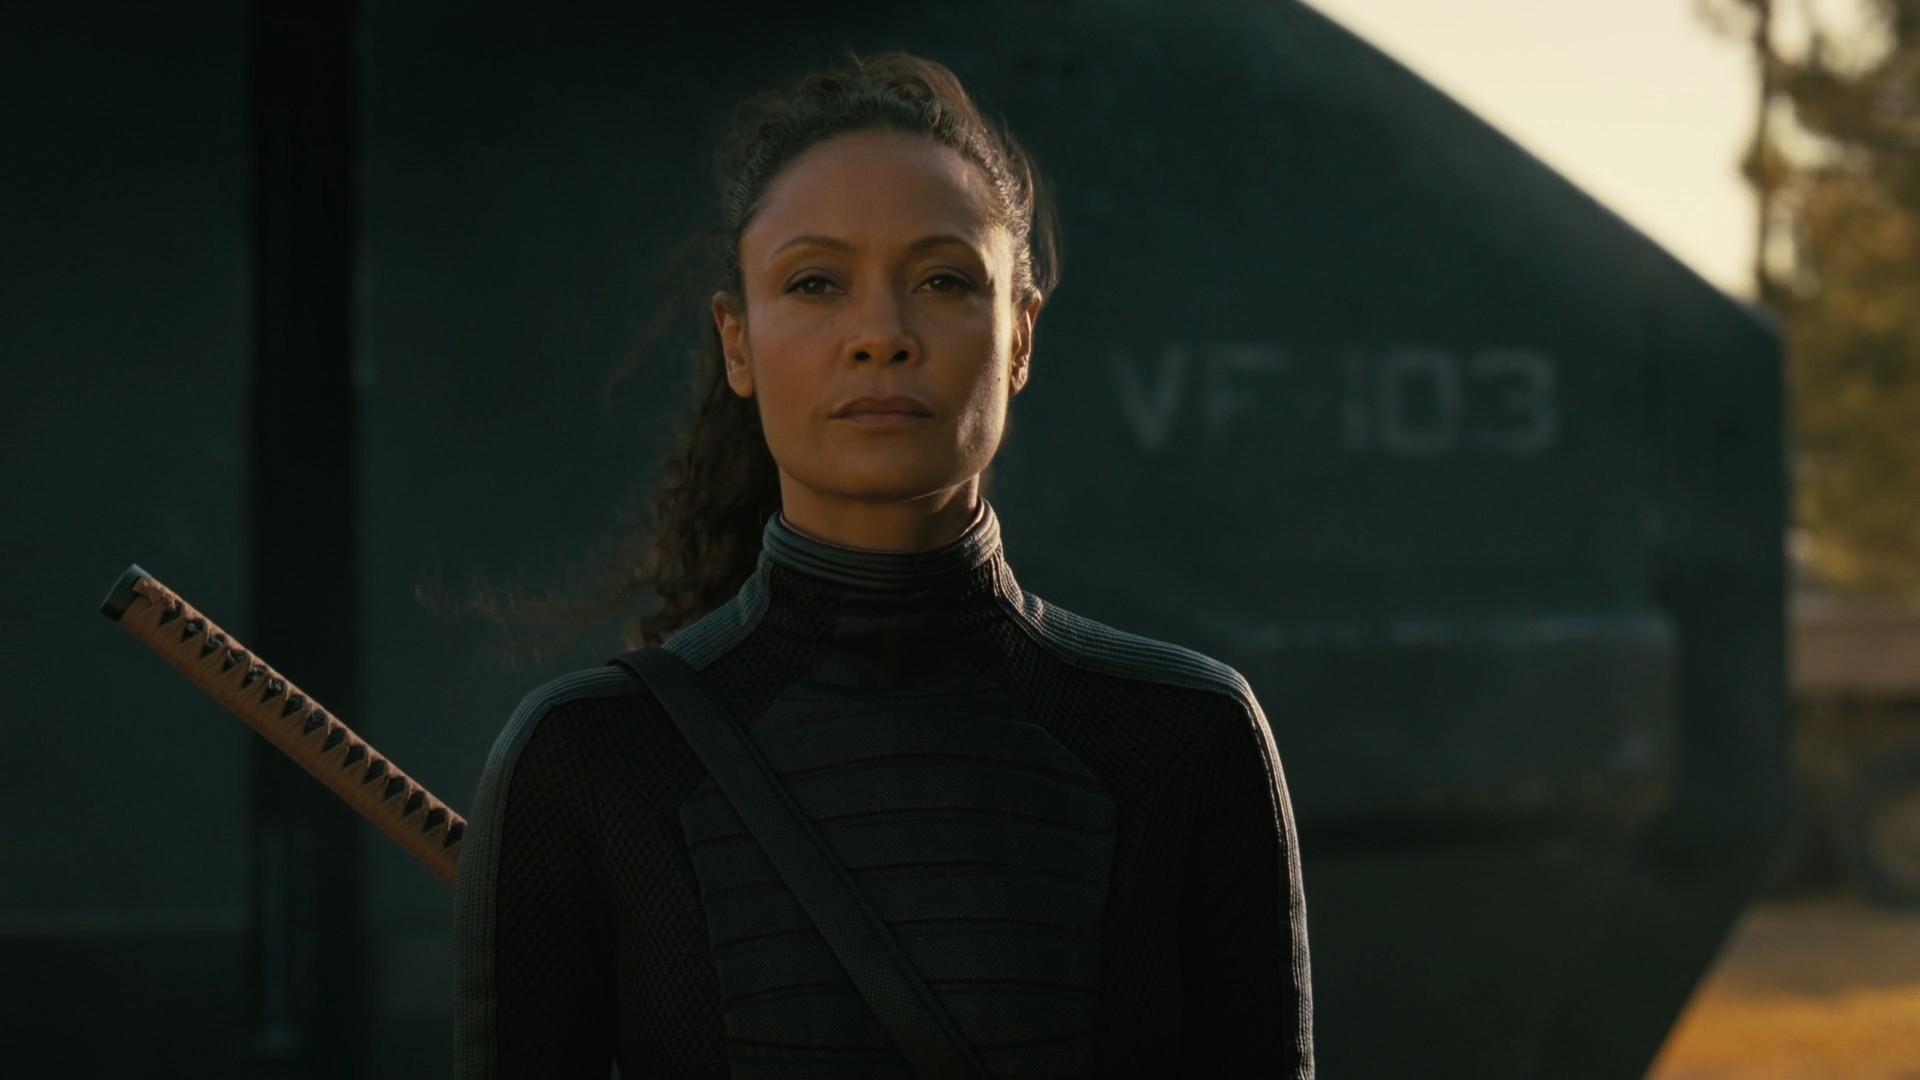 Westworld S03E07 Passed Pawn Thandie Newton as Maeve